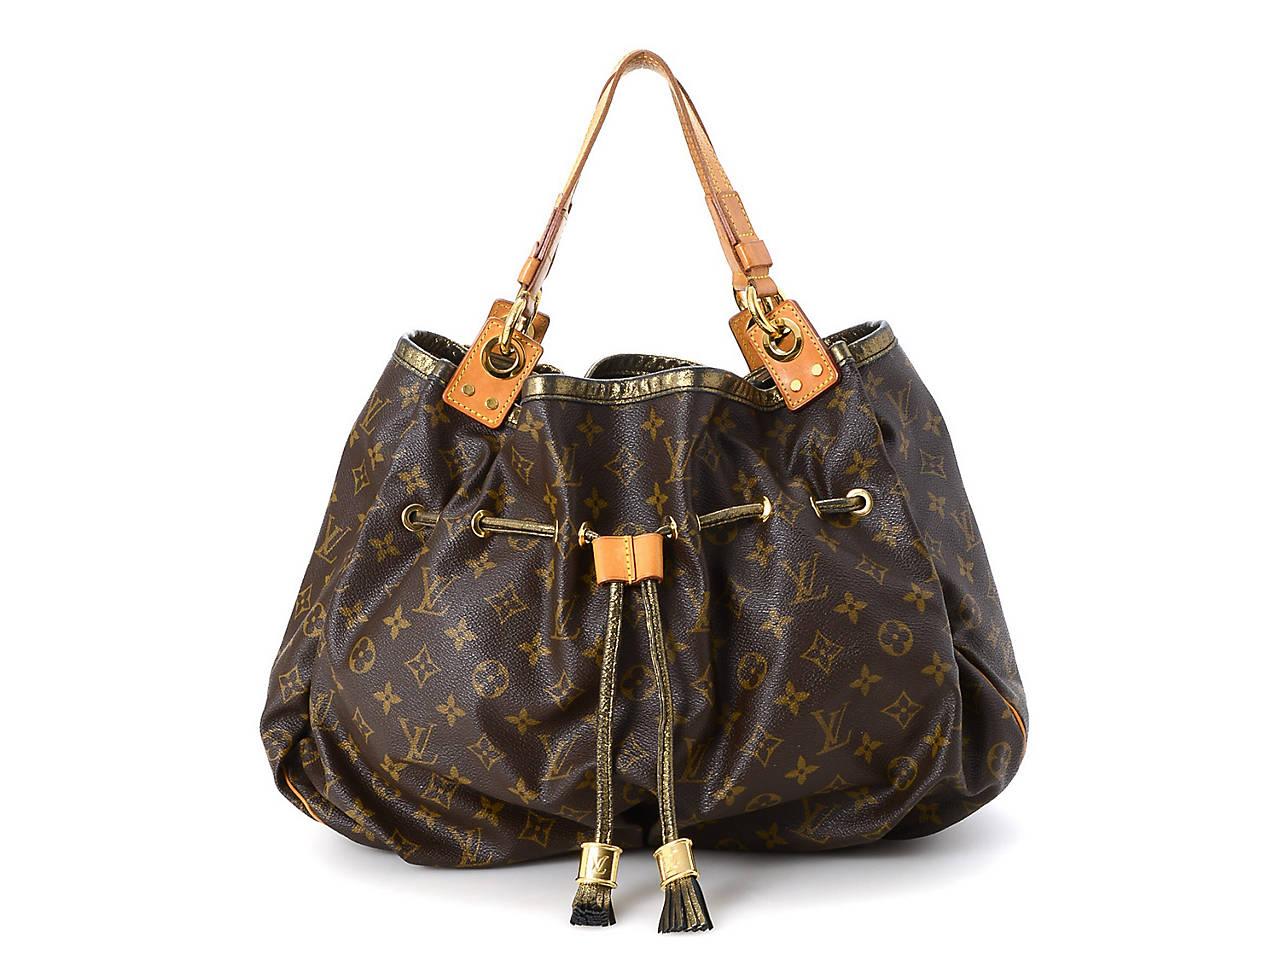 31f288480a5 Louis Vuitton - Vintage Luxury Irene Shoulder Bag Women s Handbags ...